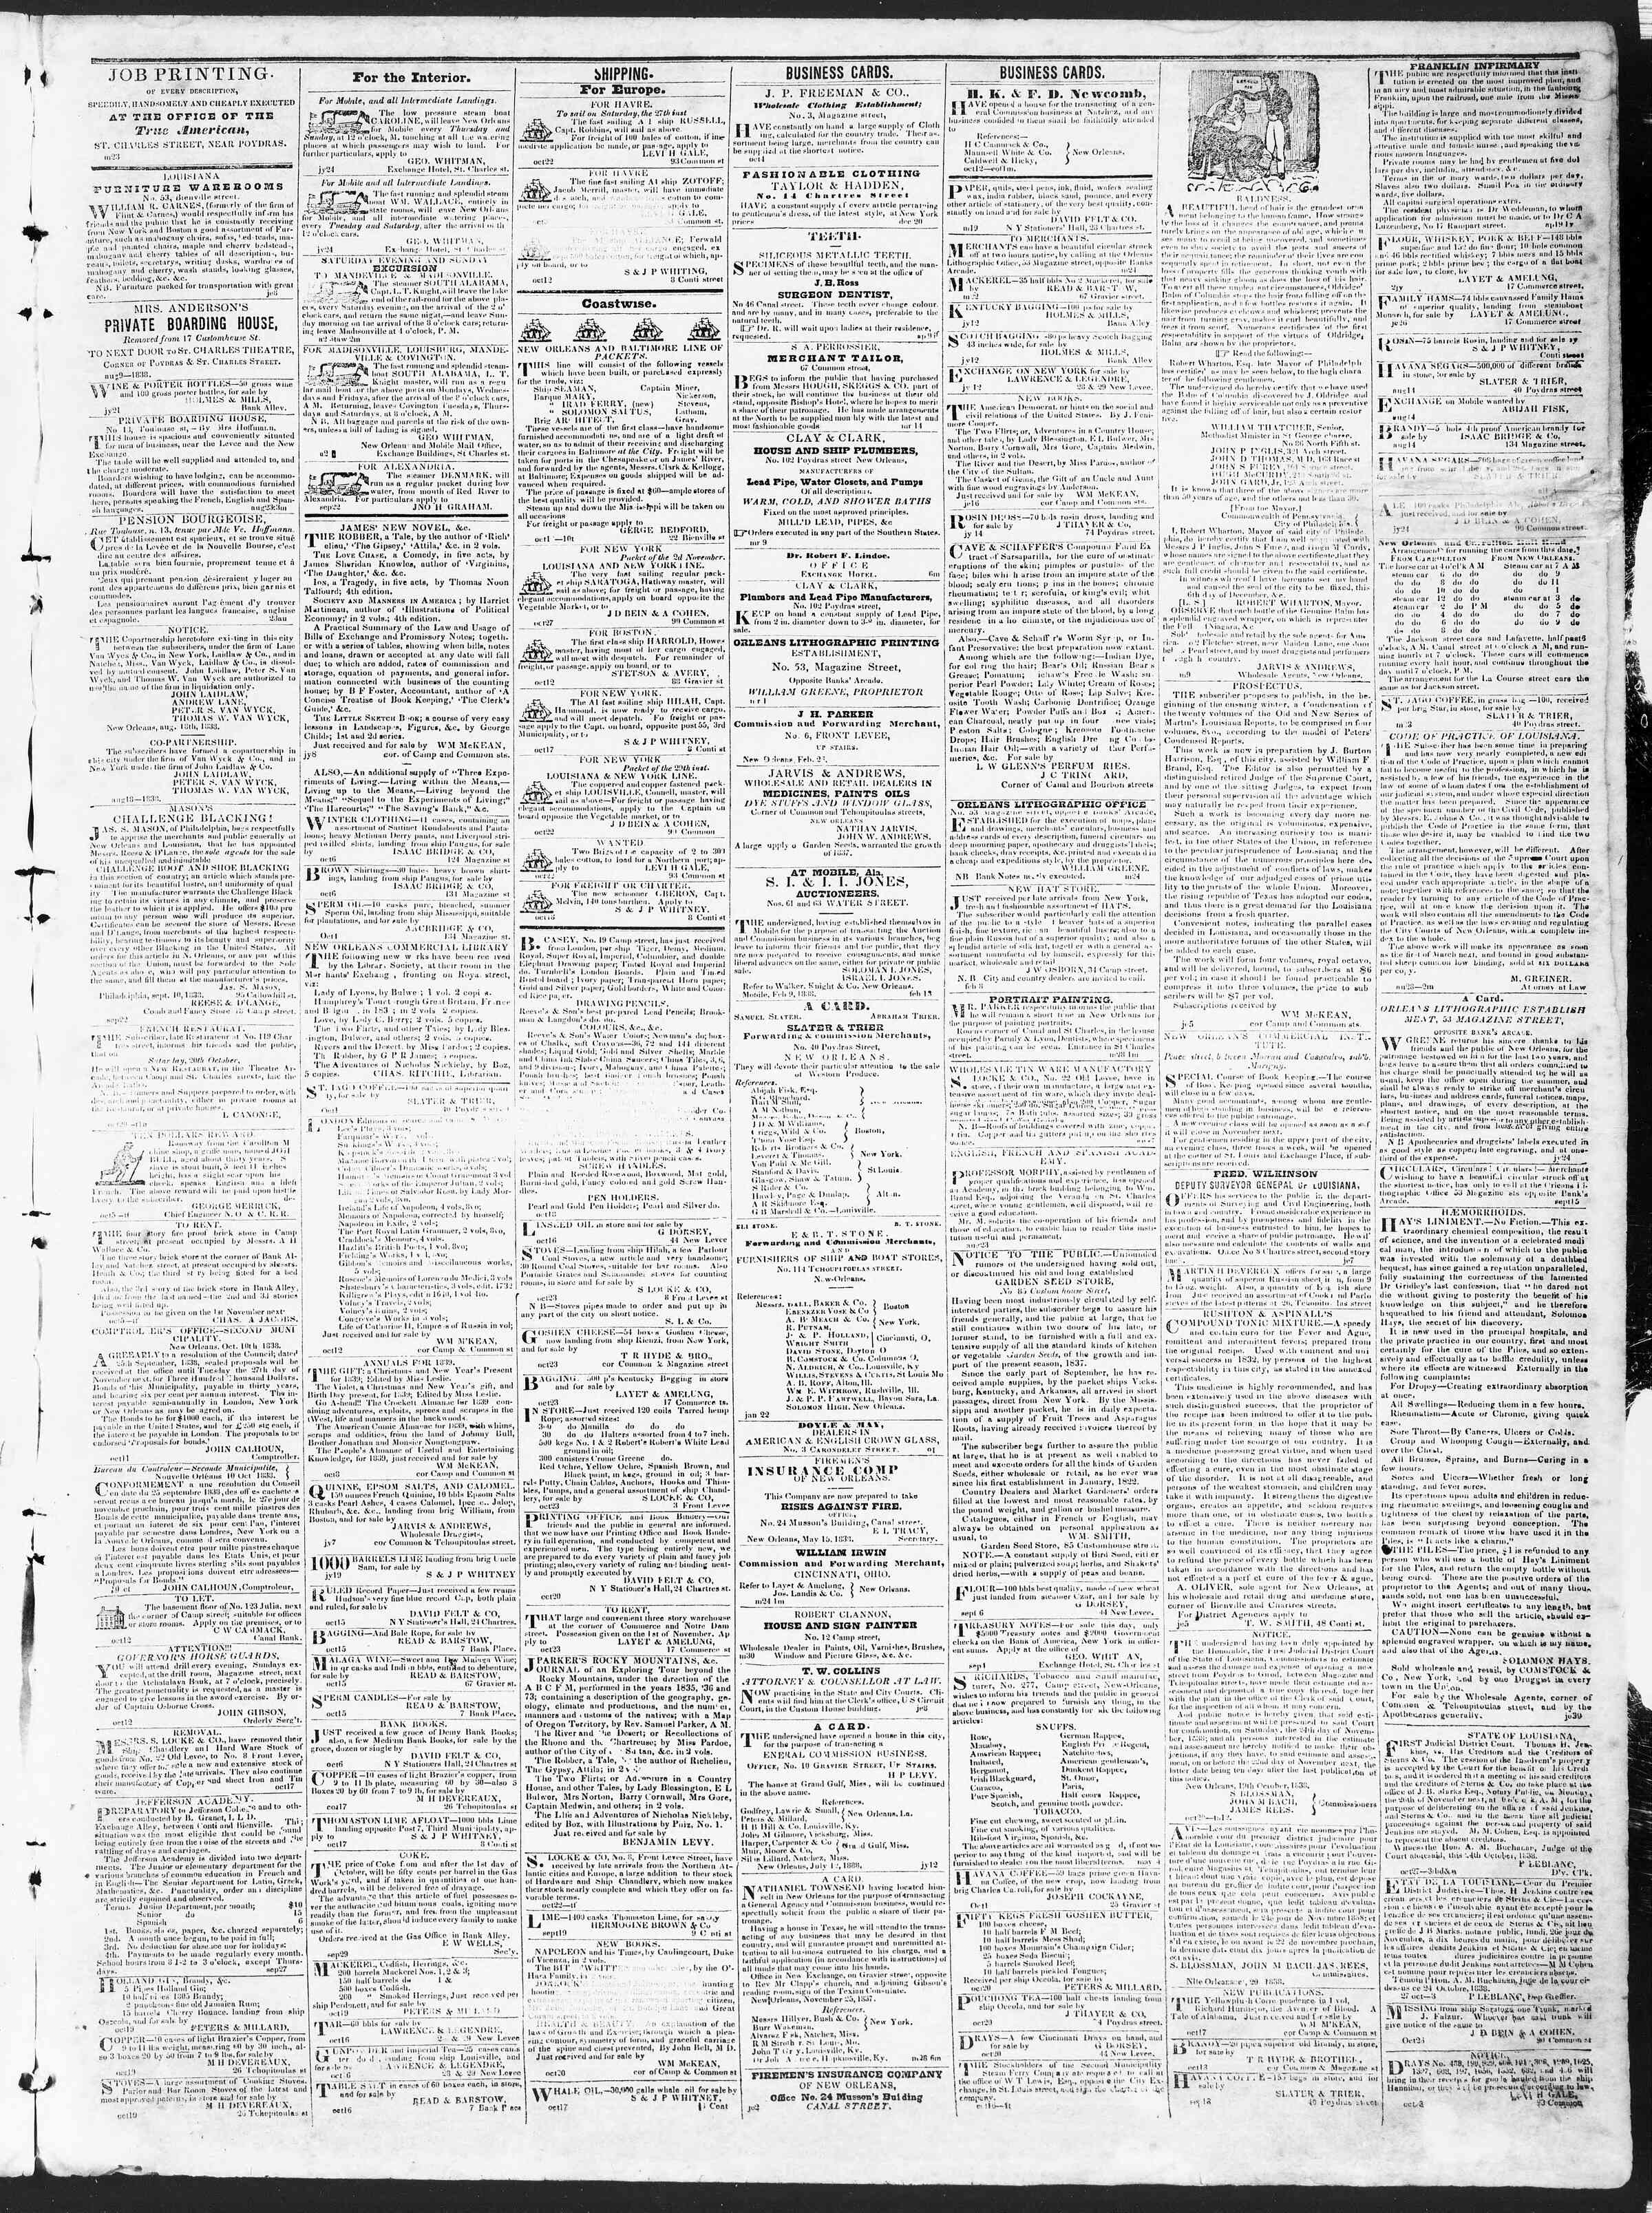 November 1, 1838 Tarihli True American Gazetesi Sayfa 3